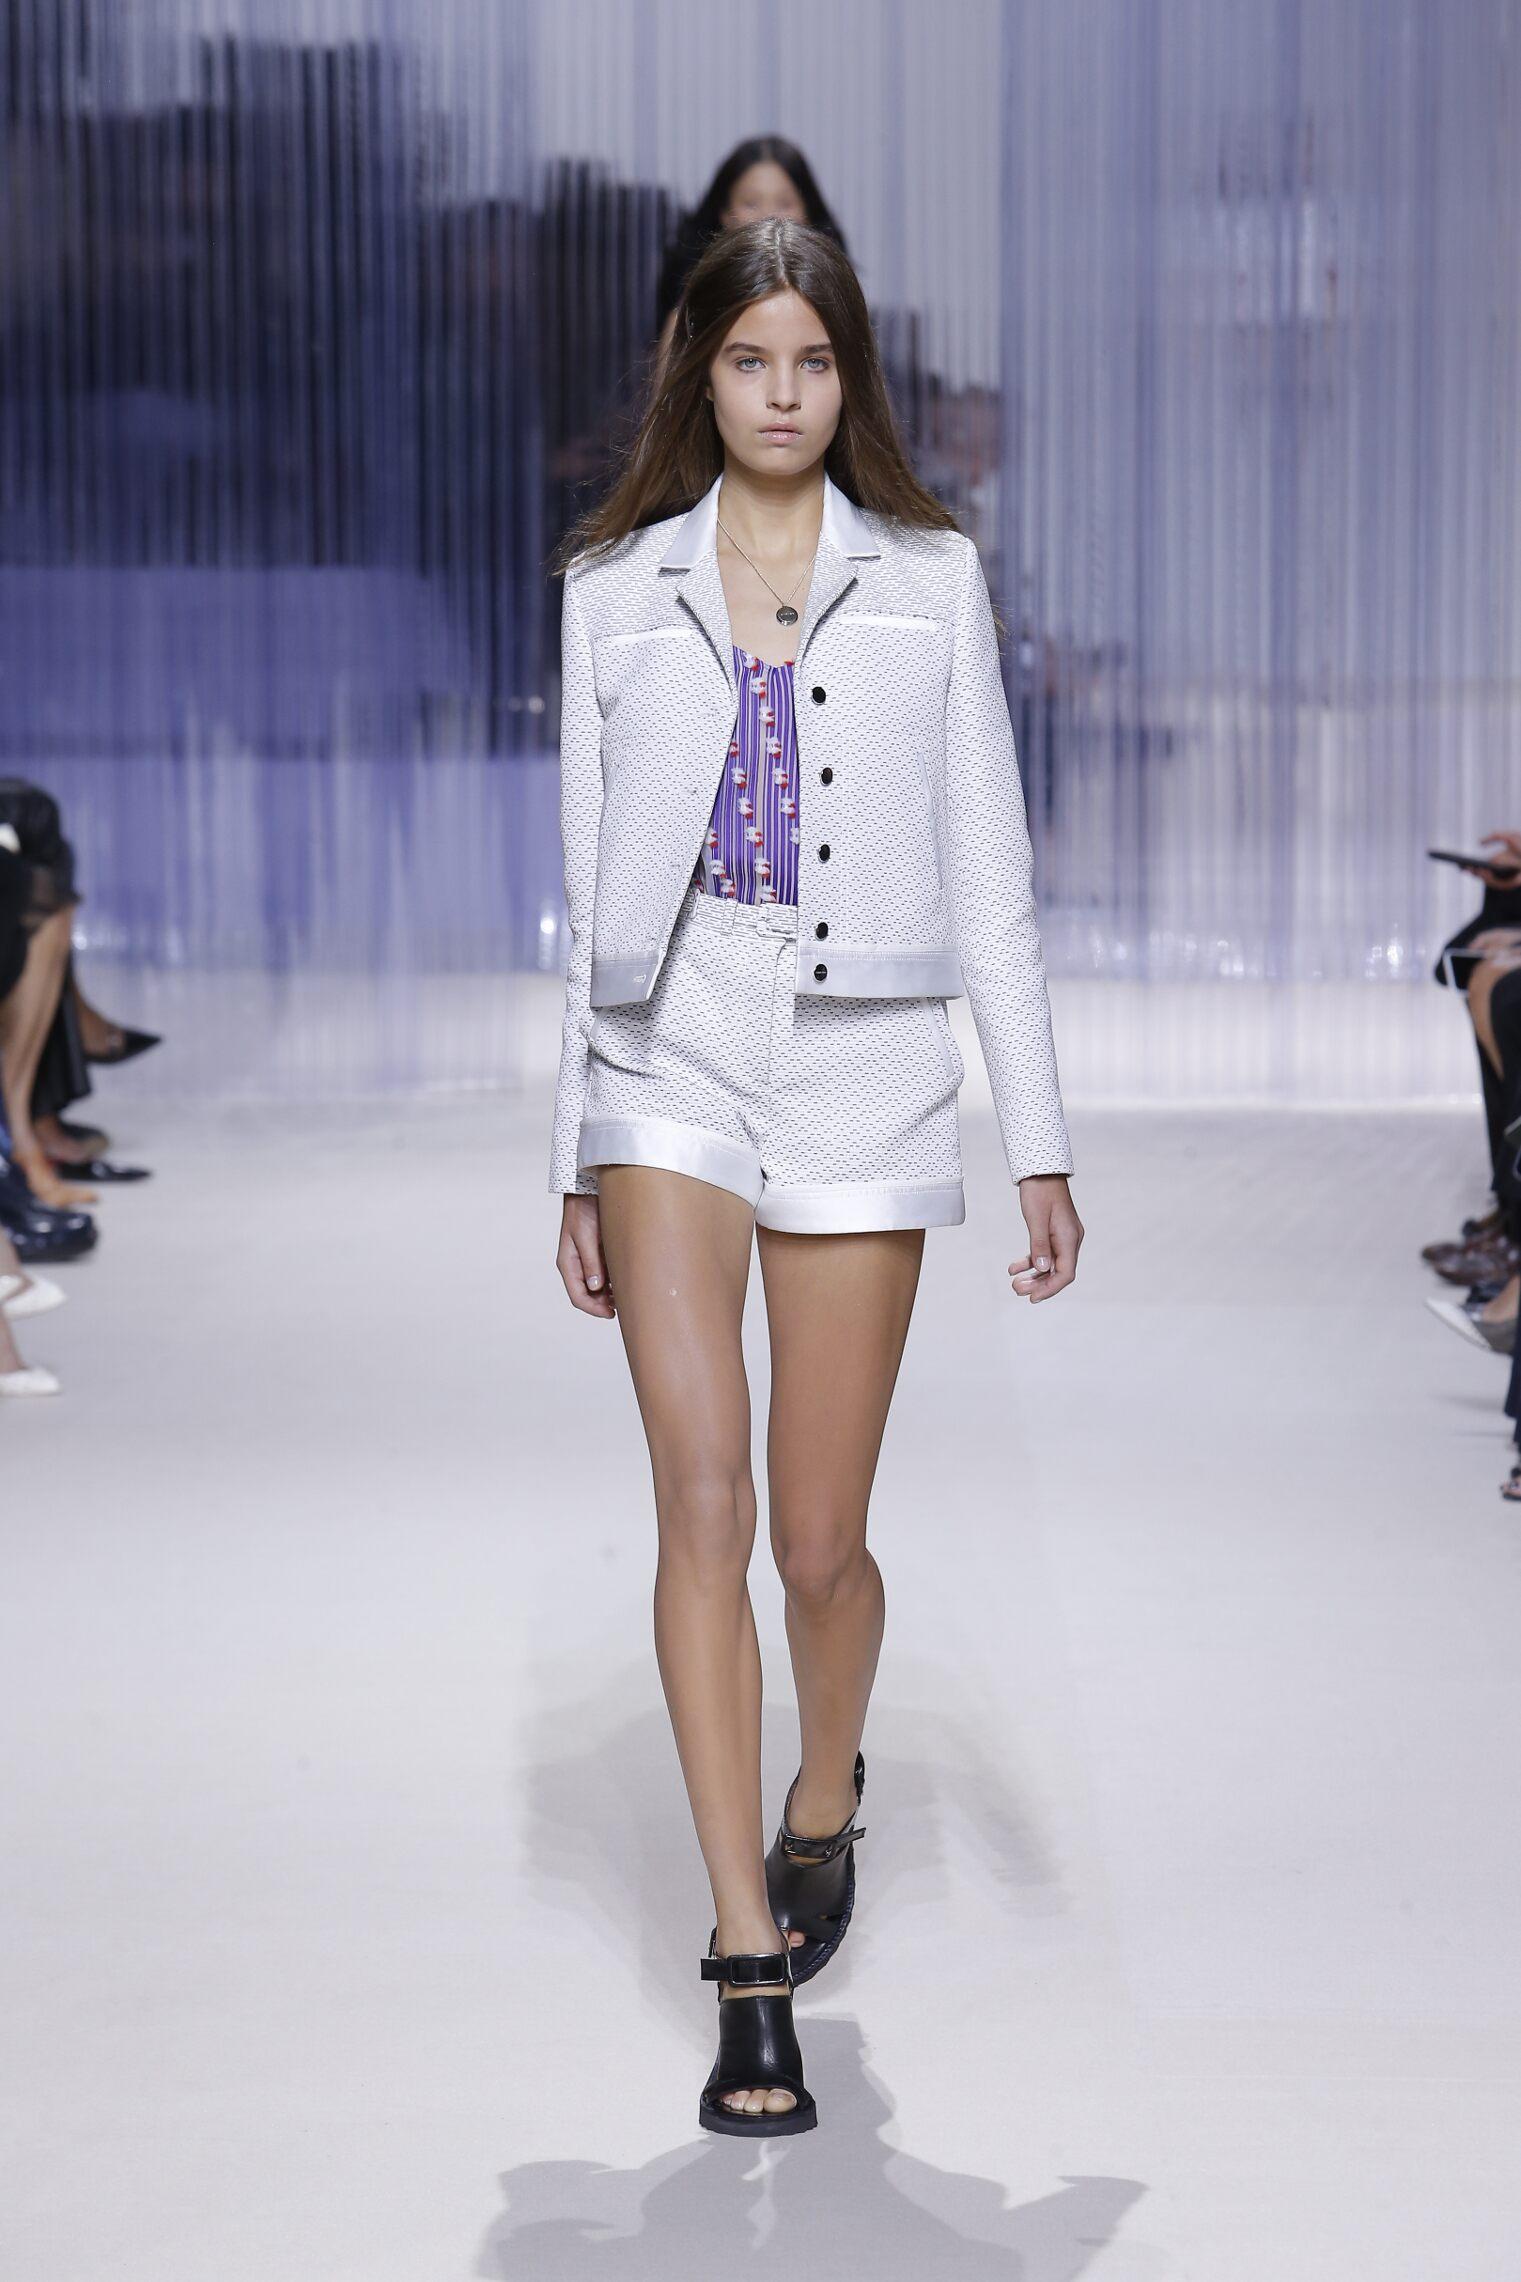 Models Fashion Show Carven